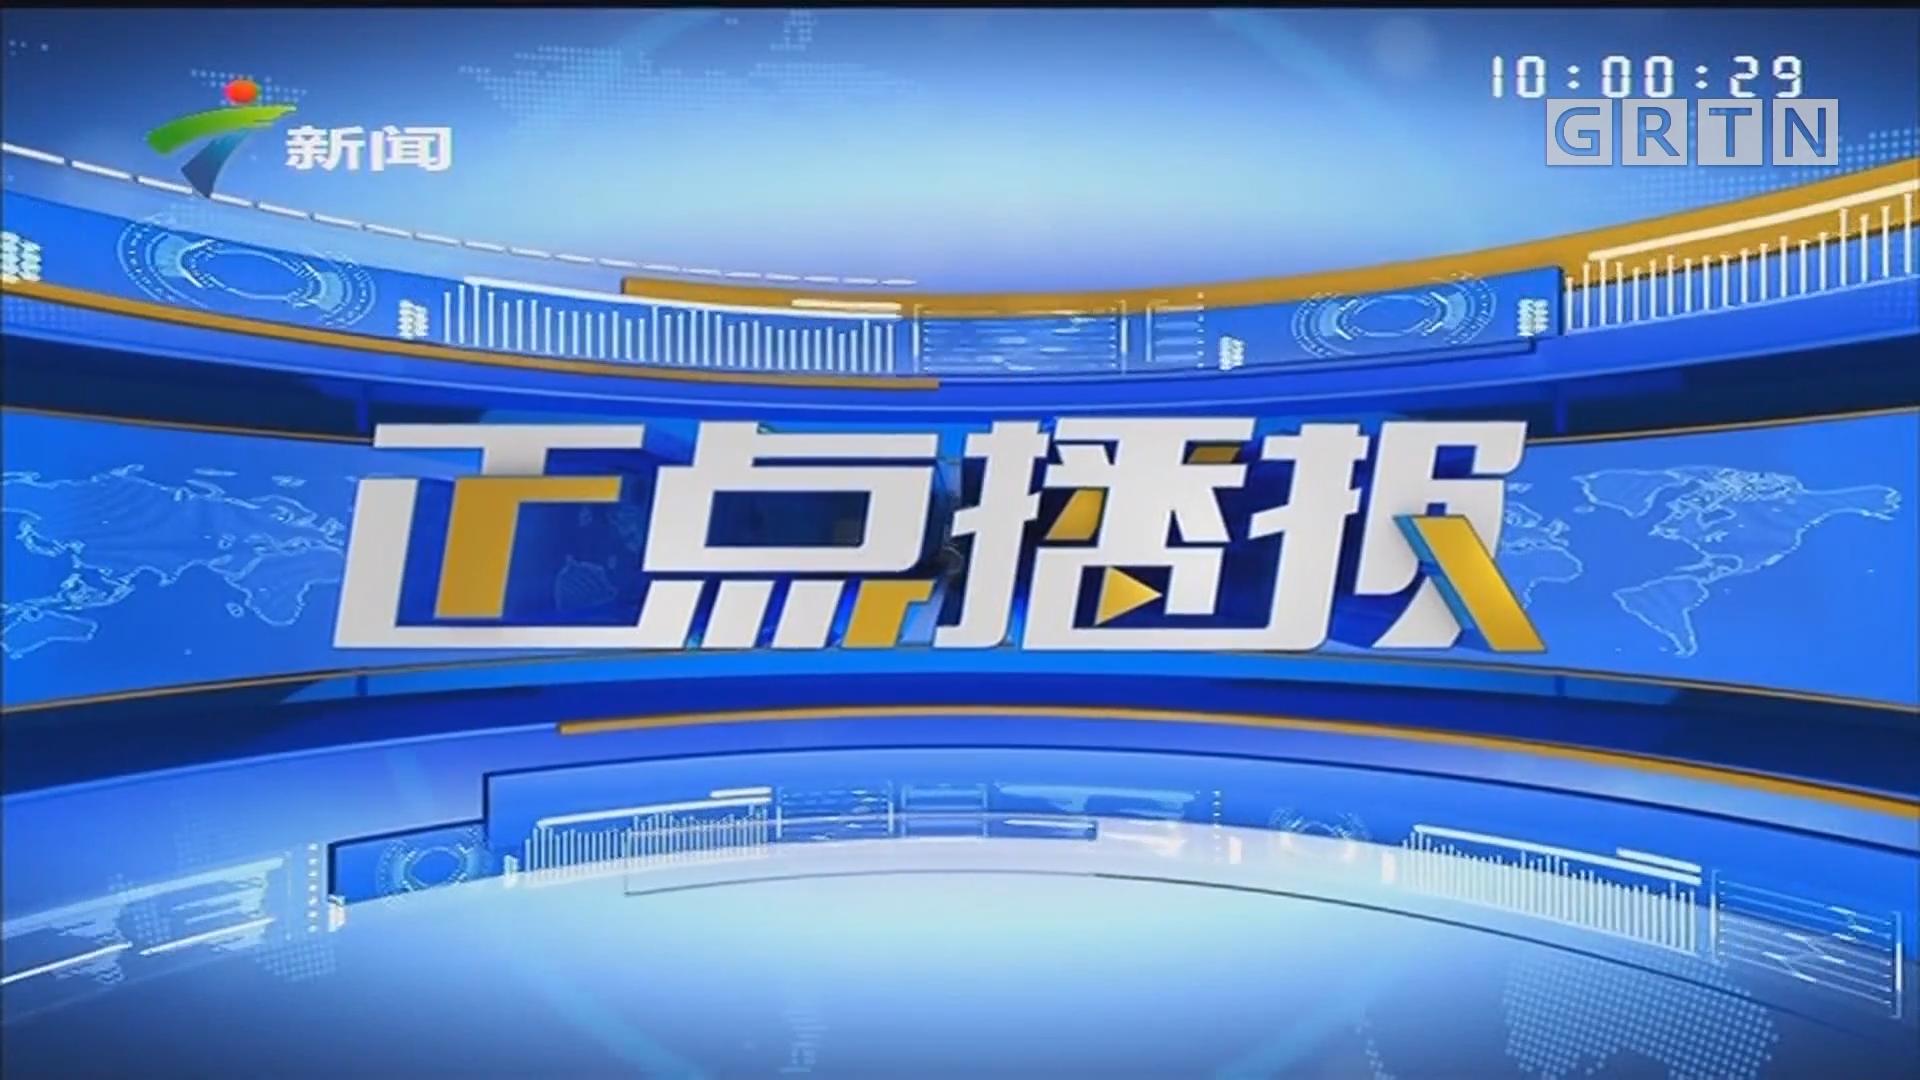 [HD][2019-10-02]正点播报:庆祝中华人民共和国成立70周年大会在京隆重举行 天安门广场举行盛大阅兵仪式和群众游行 习近平发表重要讲话并检阅受阅部队